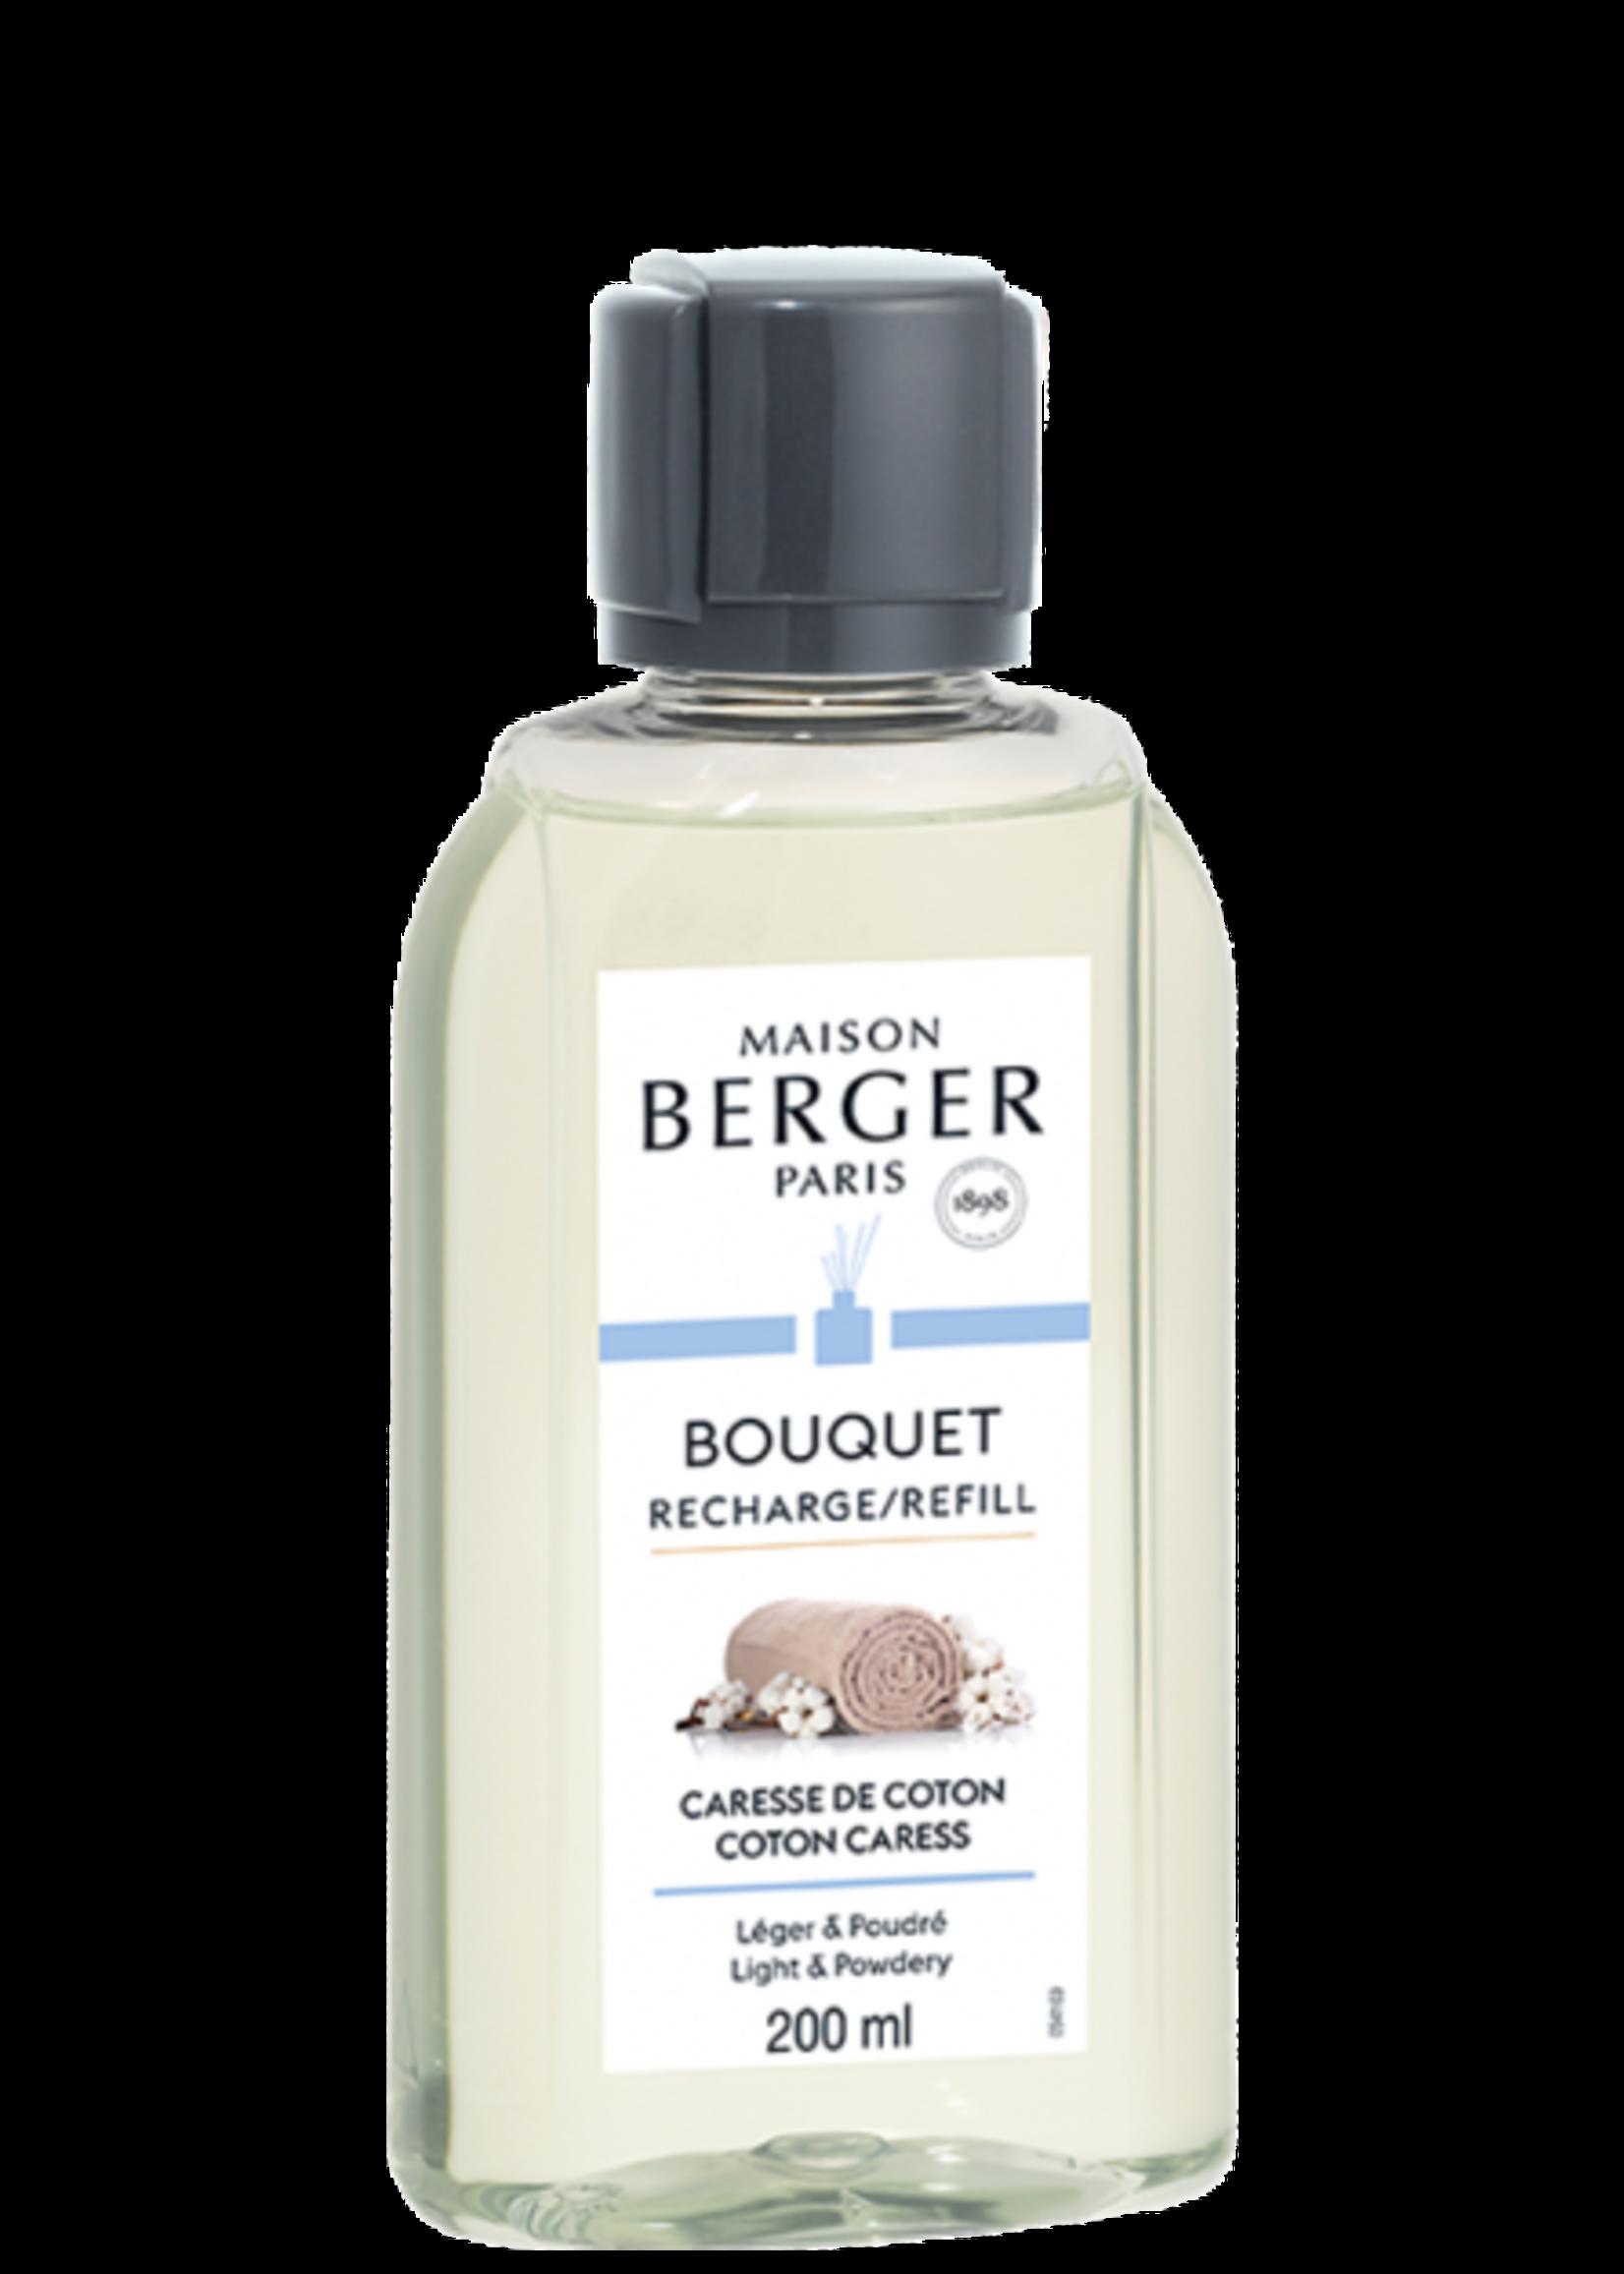 Parfum de Berger Navulling  Parfumverspreider Caresse de Coton